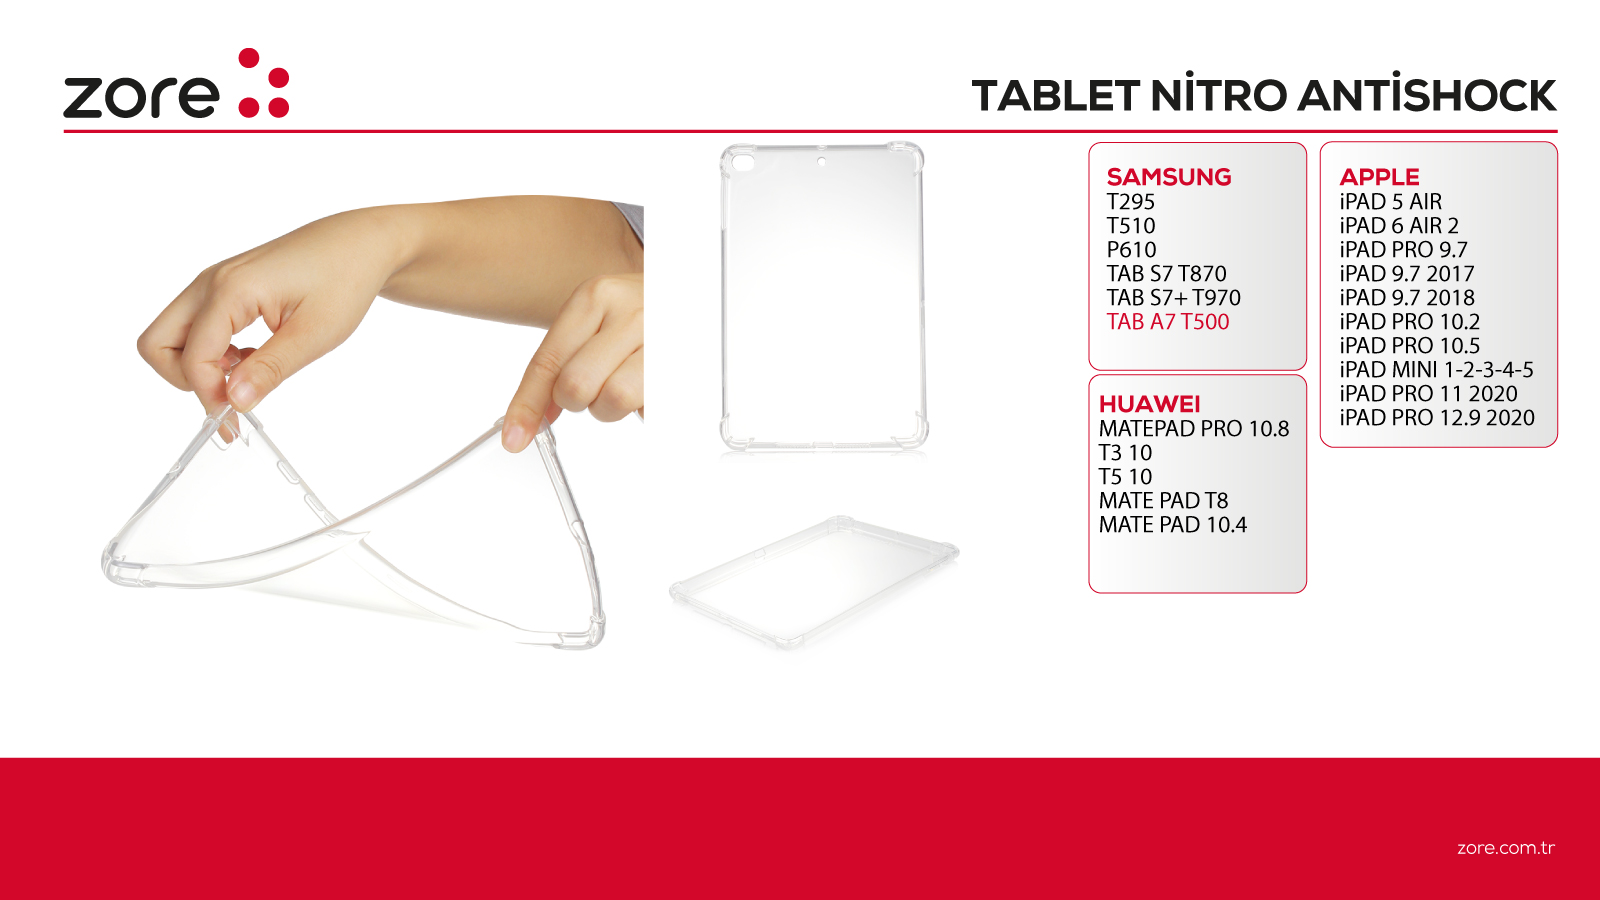 tablet nitro.jpg (275 KB)